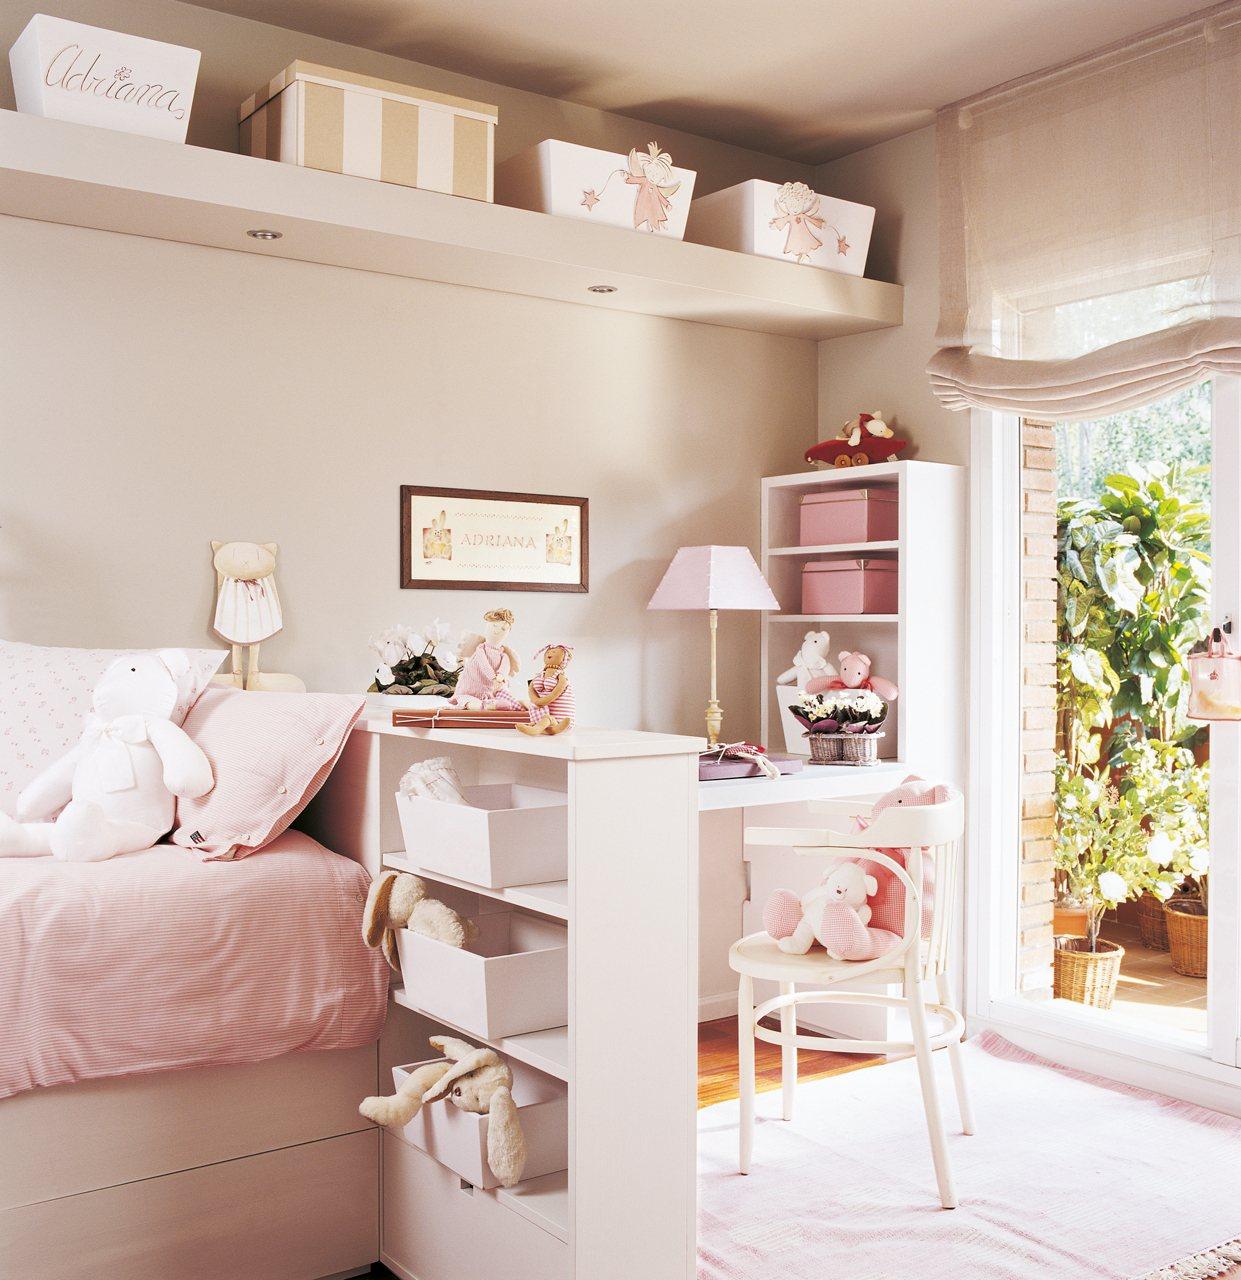 Dormitorios infantiles peque os s cales partido - Dormitorios infantiles ...